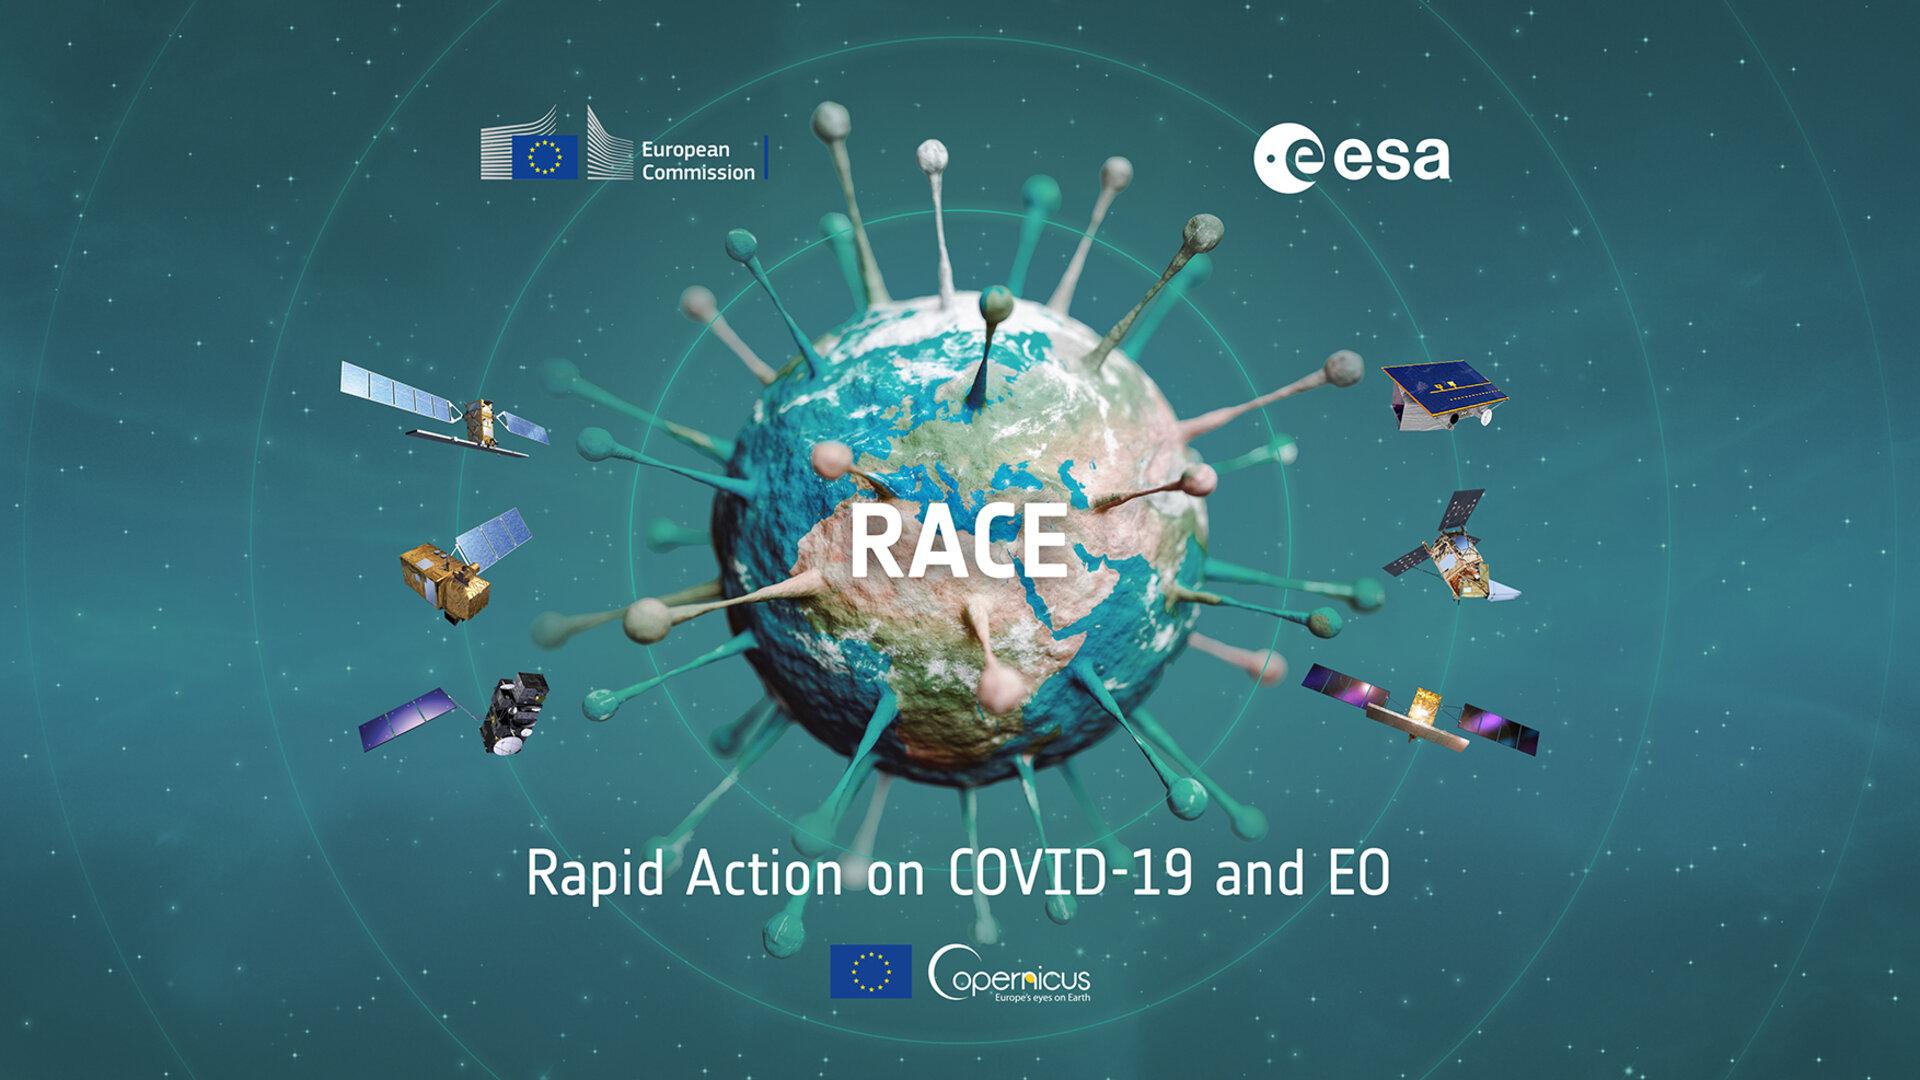 ESA - La piattaforma RACE ora disponibile